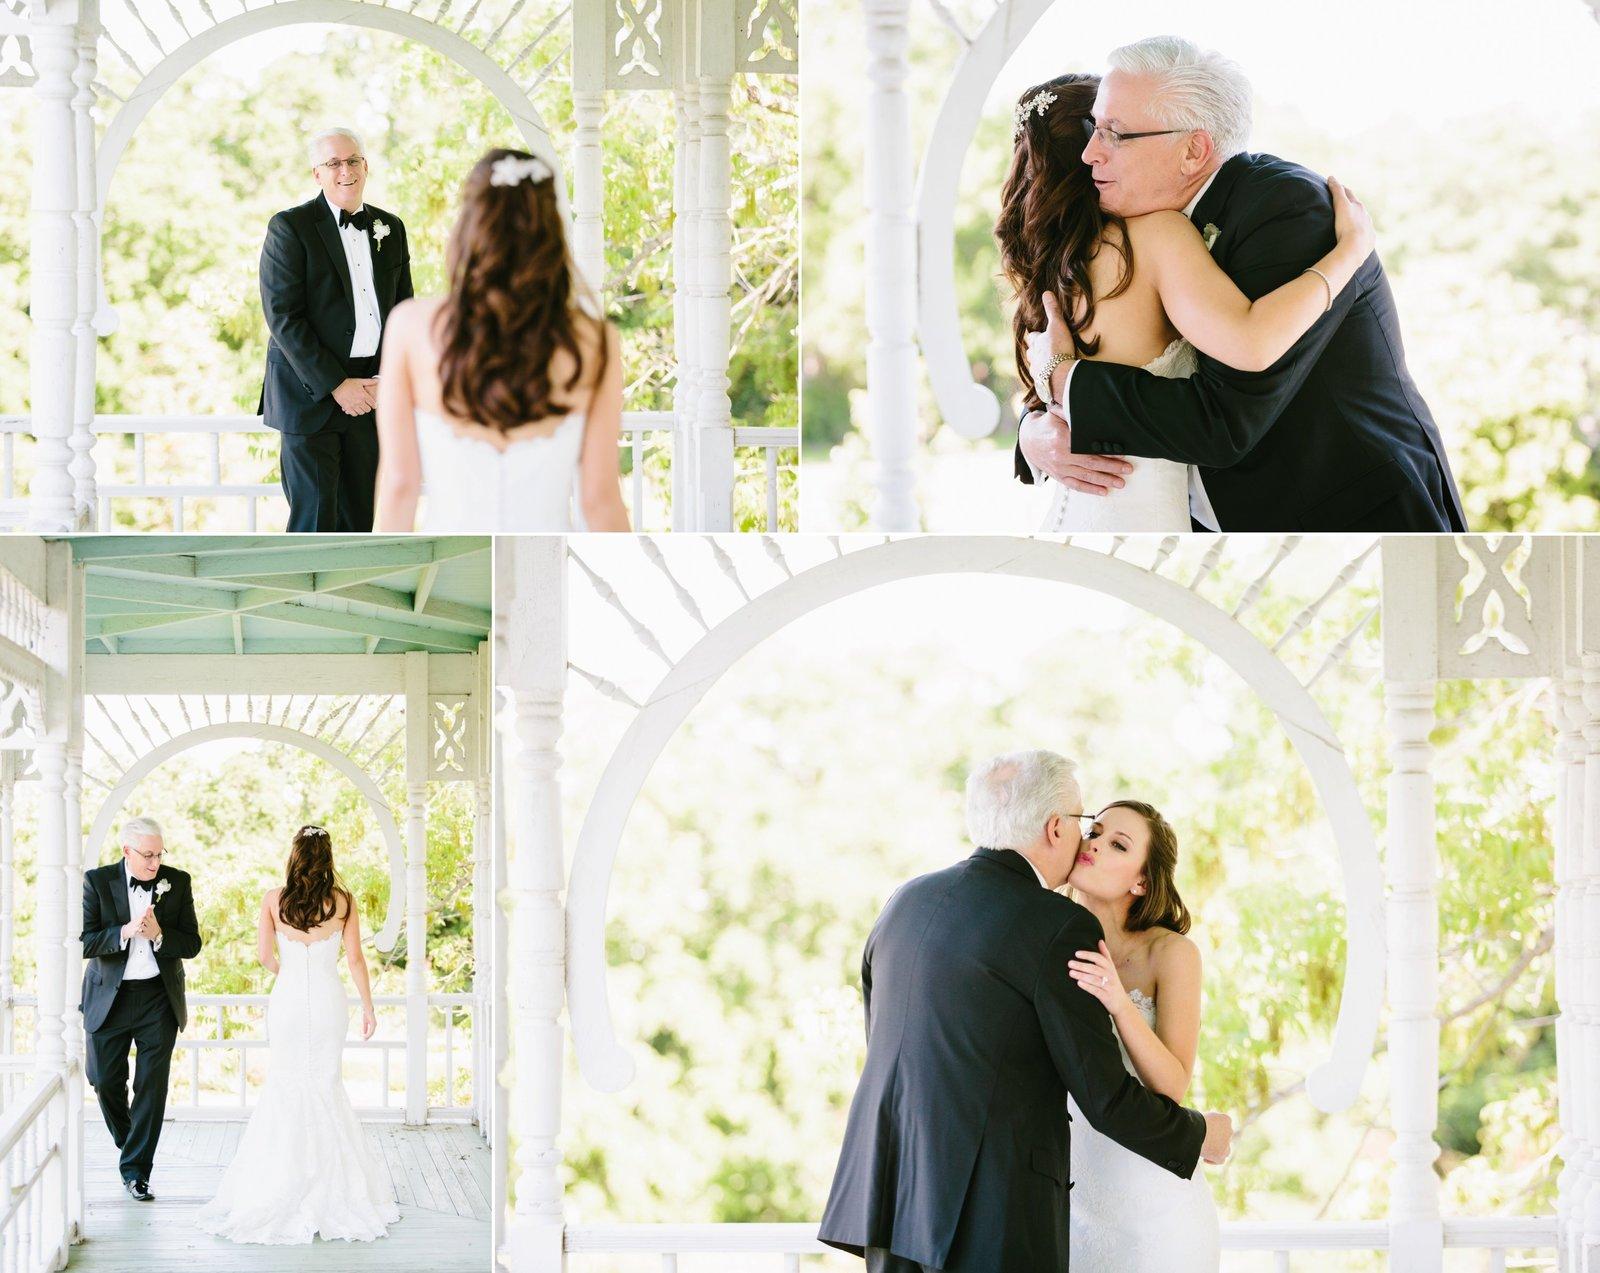 Wedding Photos-Jodee Debes Photography-352